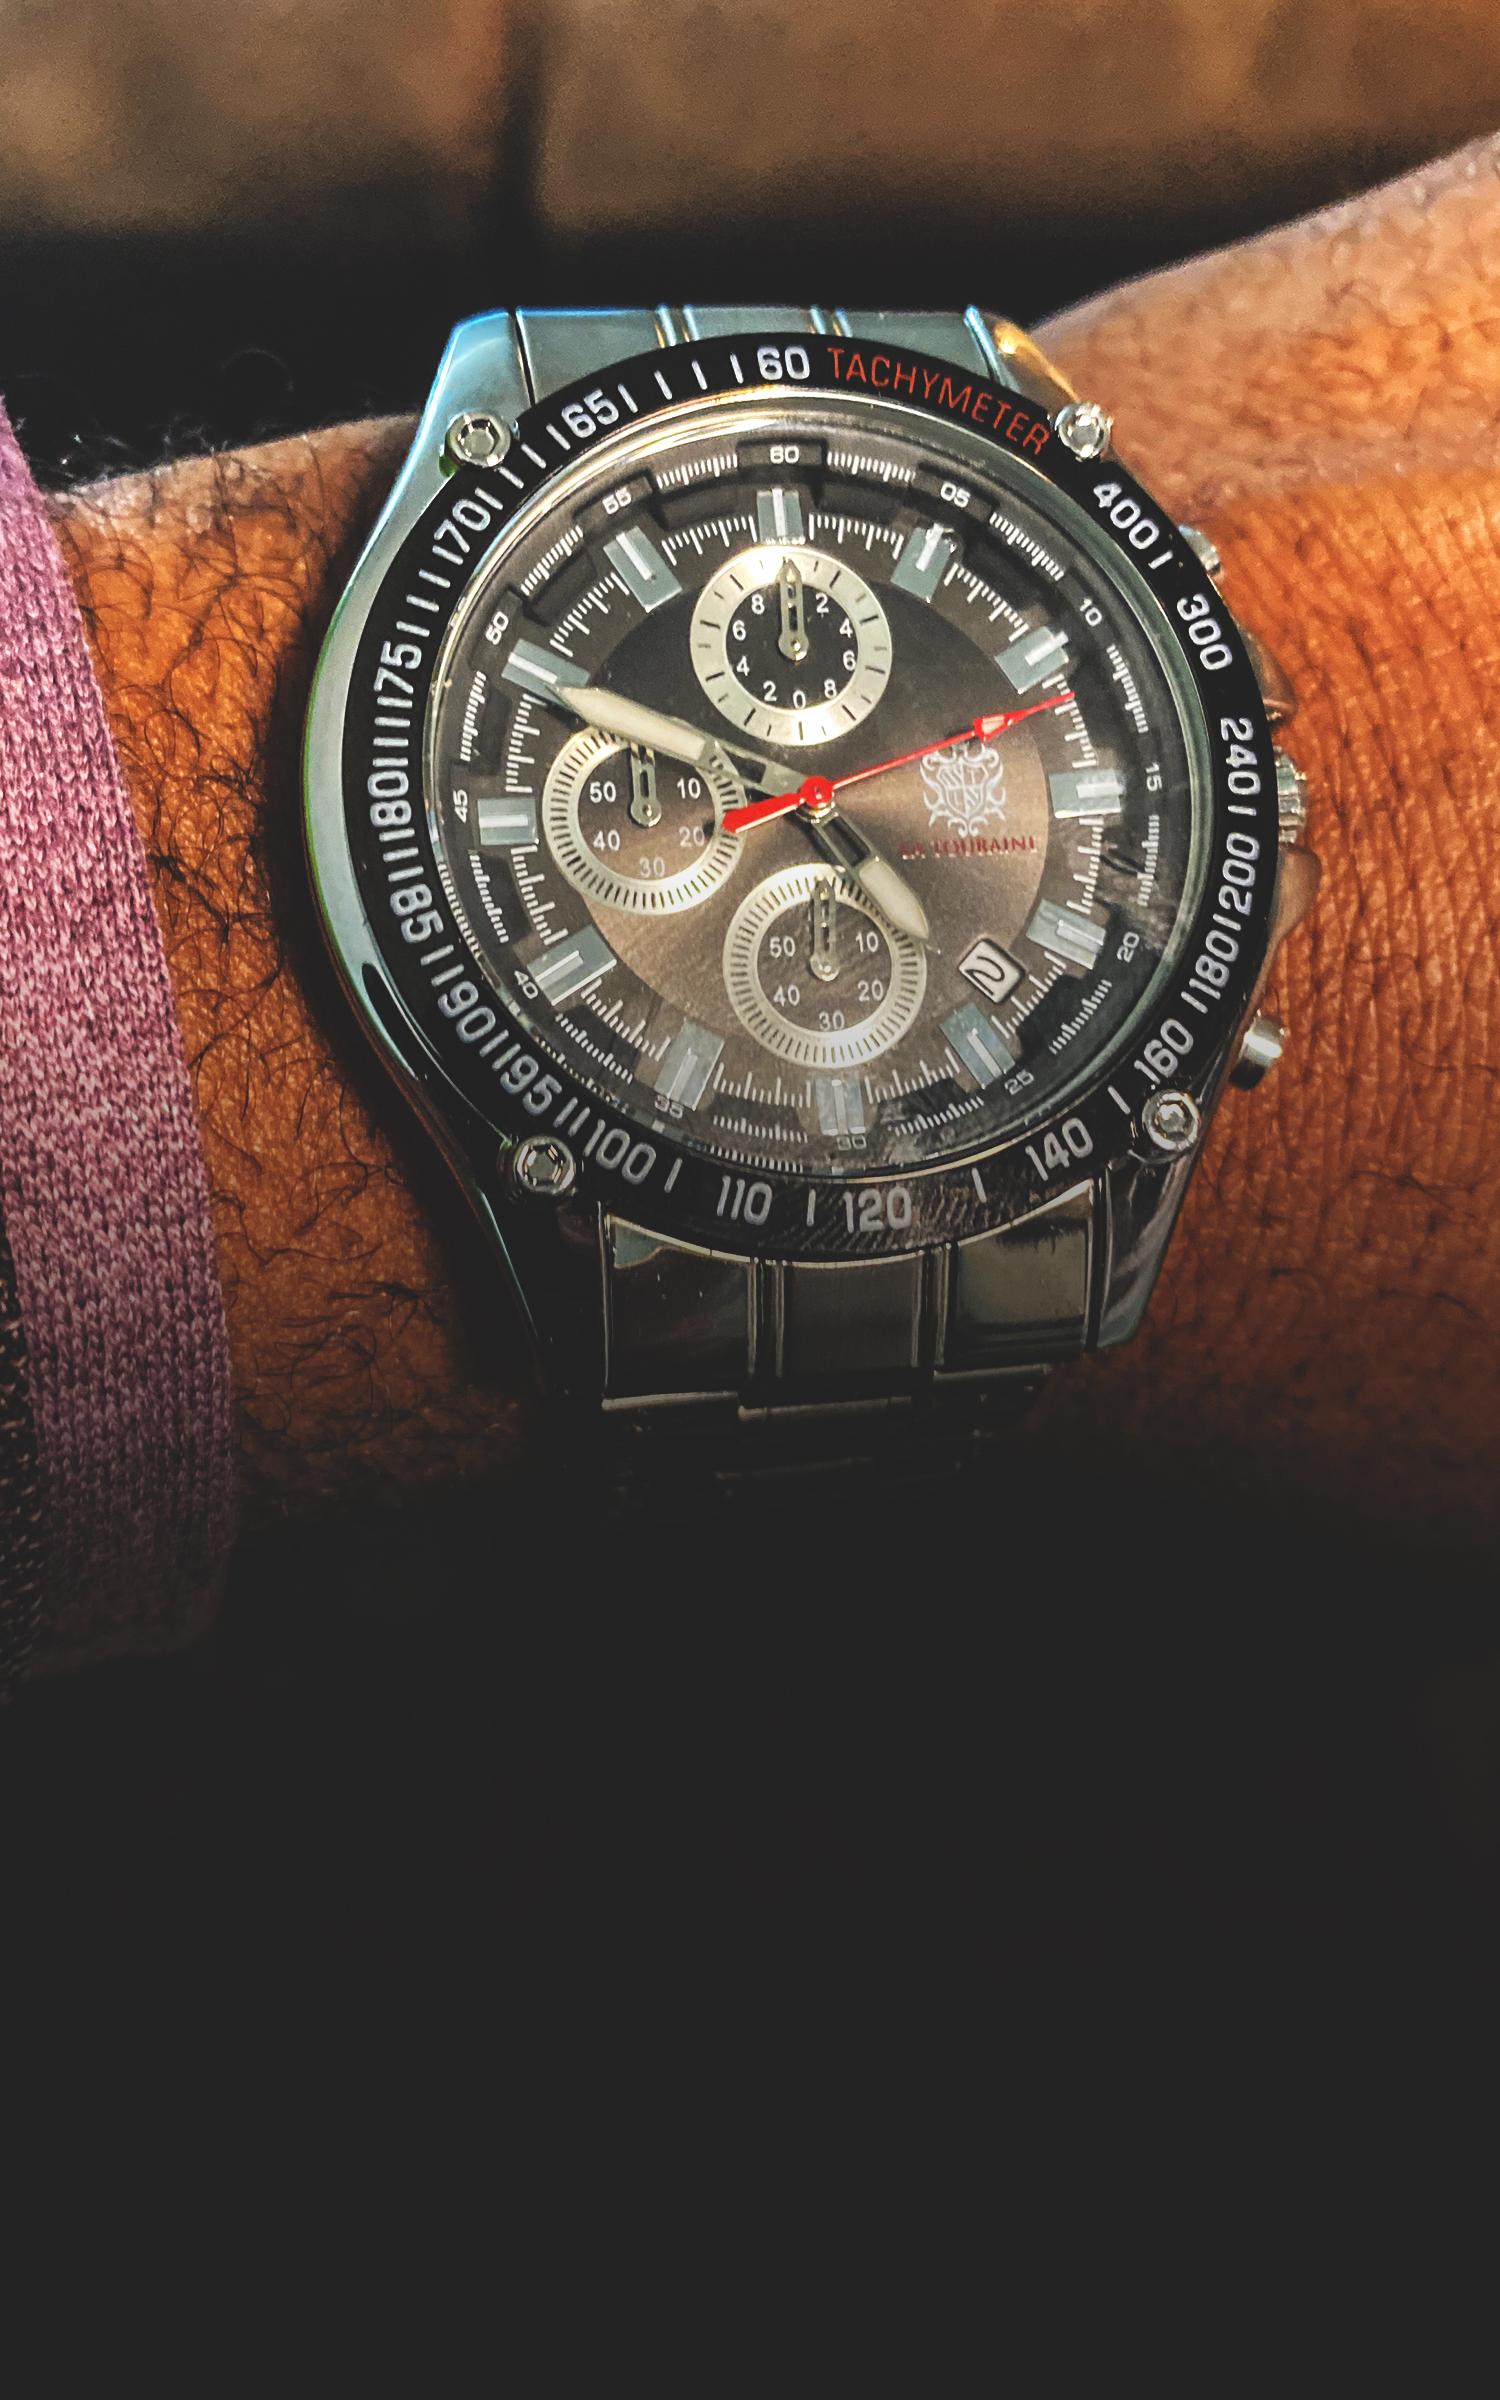 Get Your La Touraine Watch